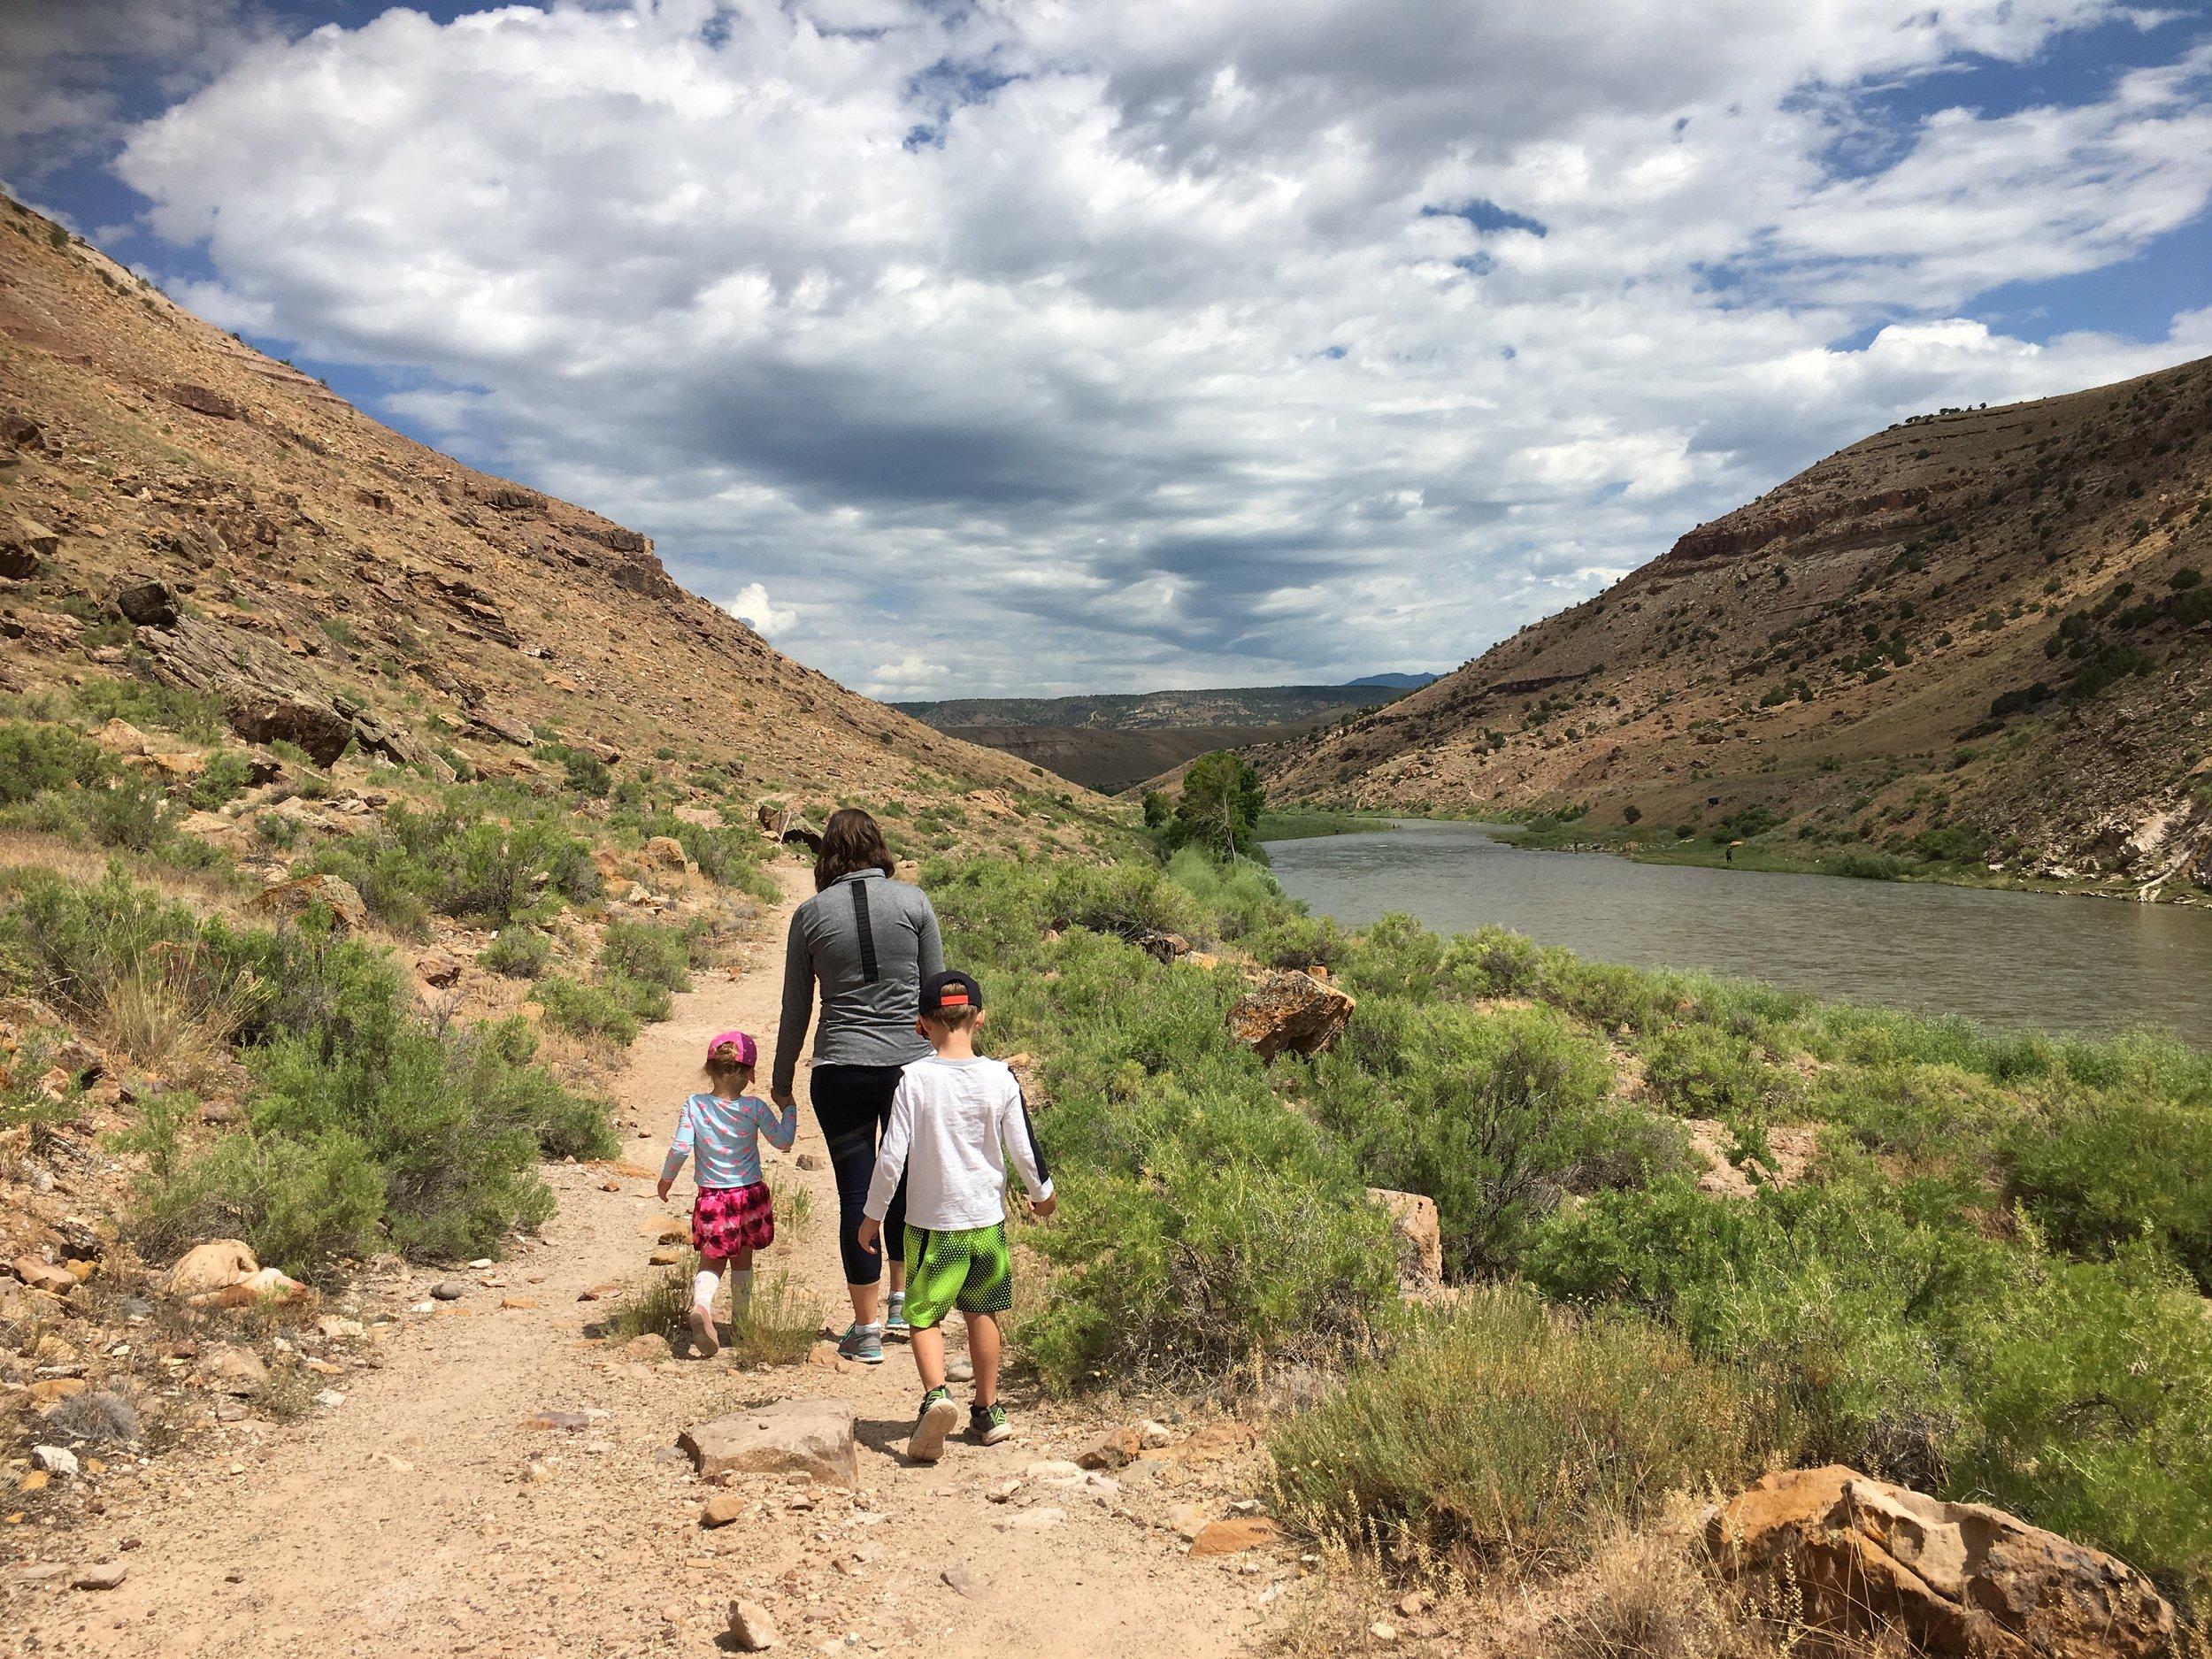 Eric McMaster's family: Kim, Rivers + Edith walking along the Gunnison River.